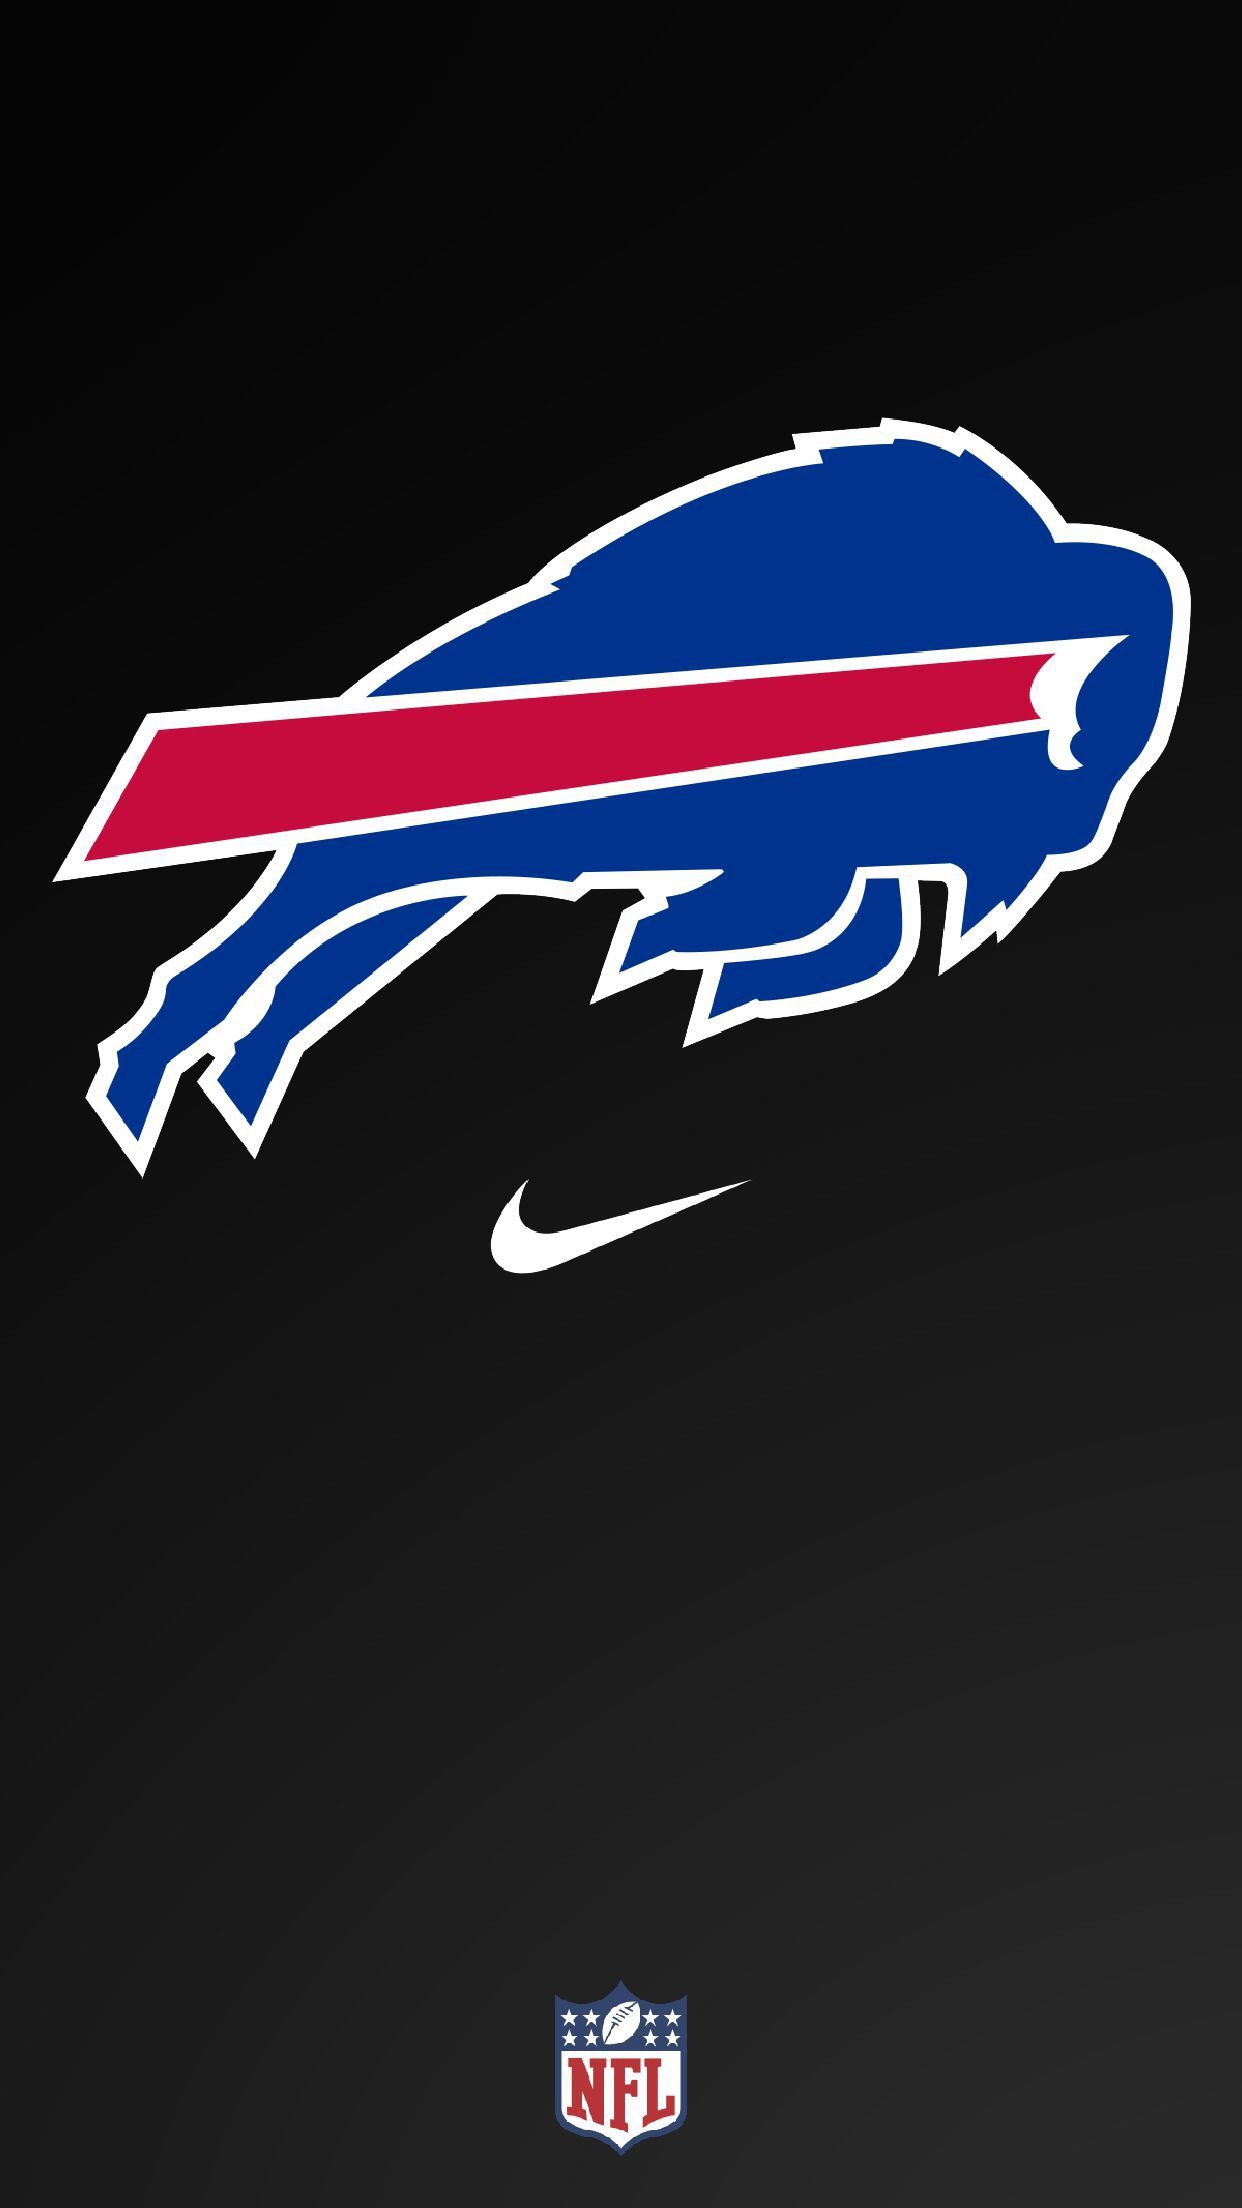 Buffalo Bills Nike Wallpaper Buffalo Bills Nike Wallpaper Buffalo